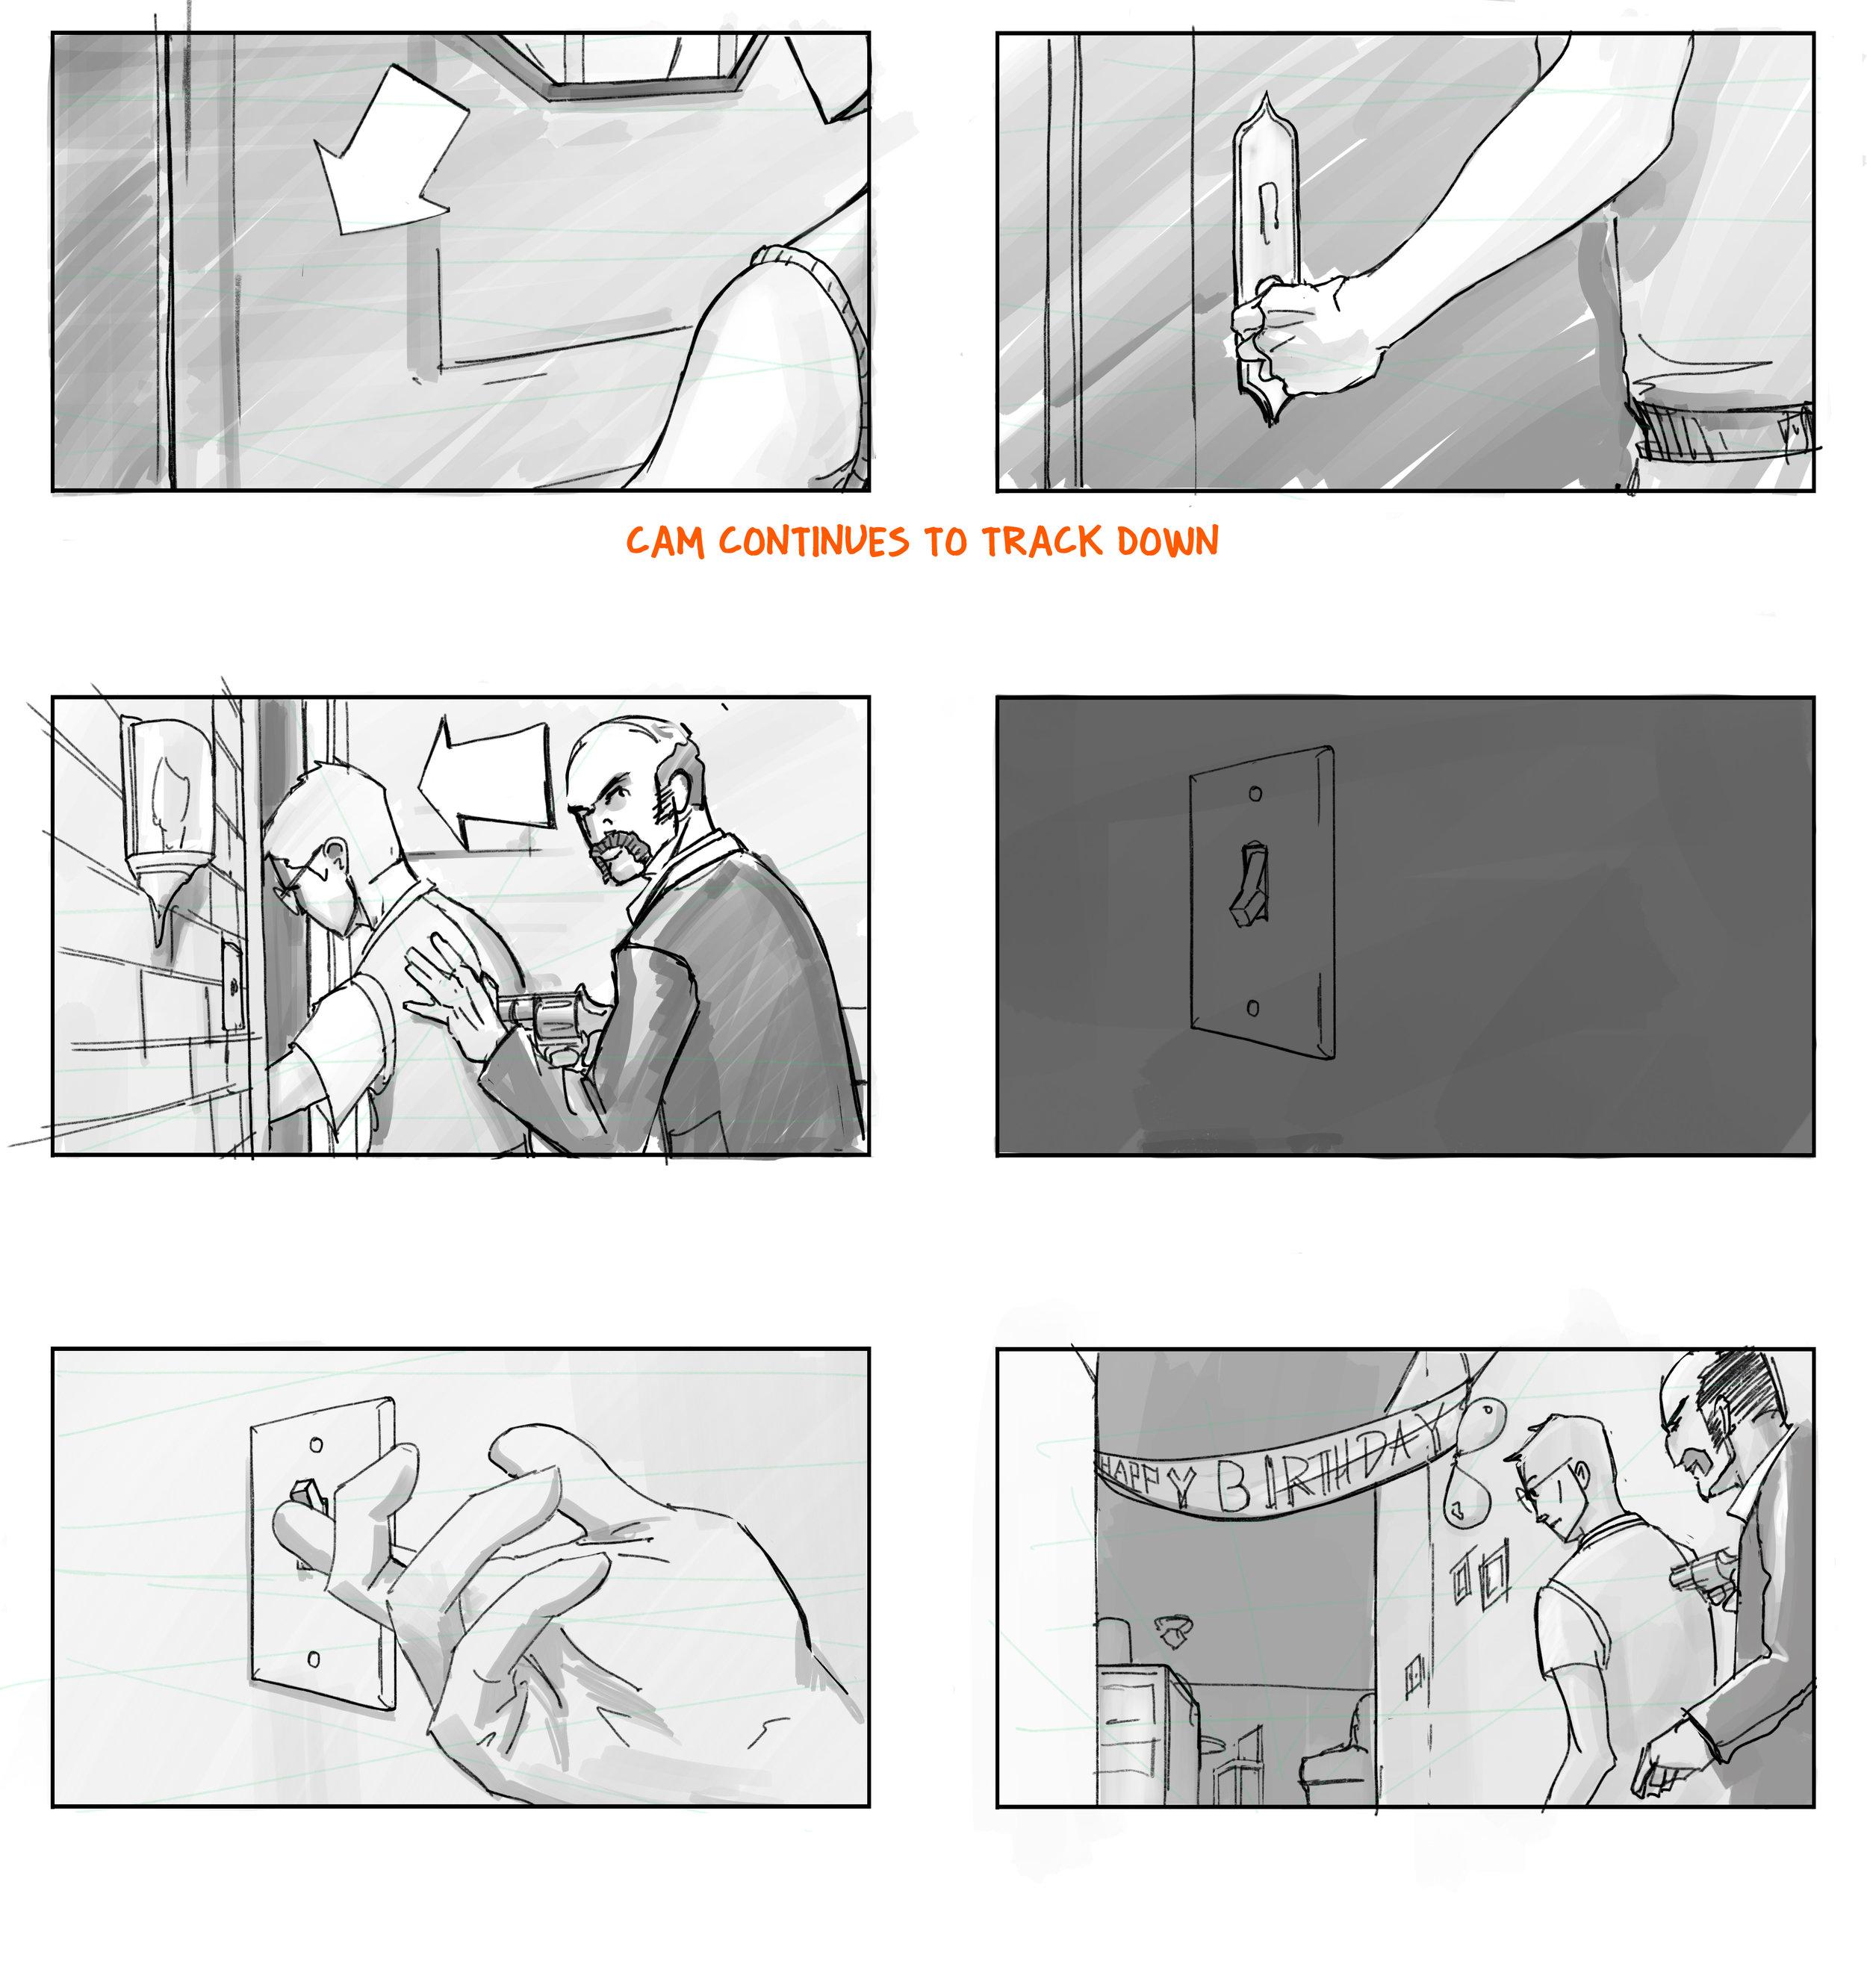 SAM_BS_Catapano_Storyboards_002.jpg